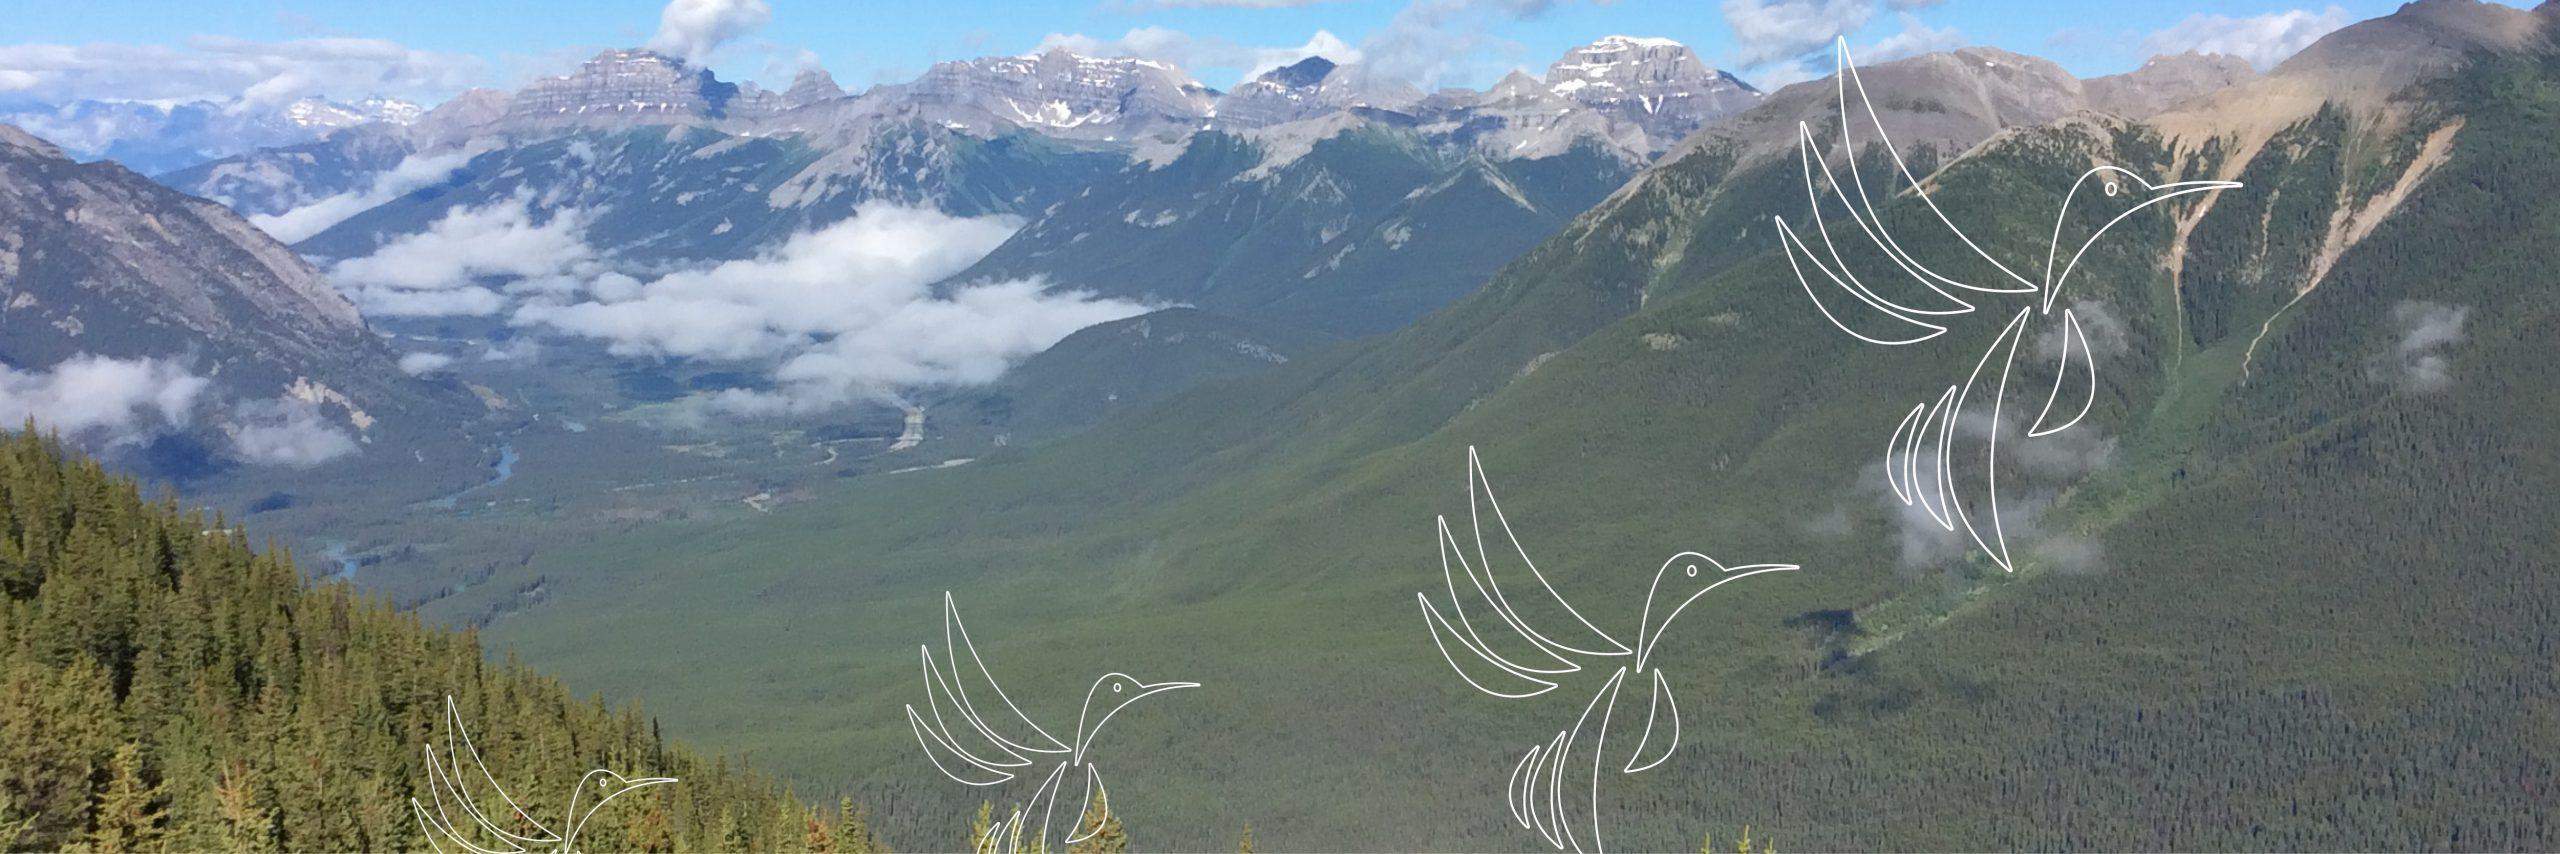 Birds taking flight - mountainscape in British Columbia